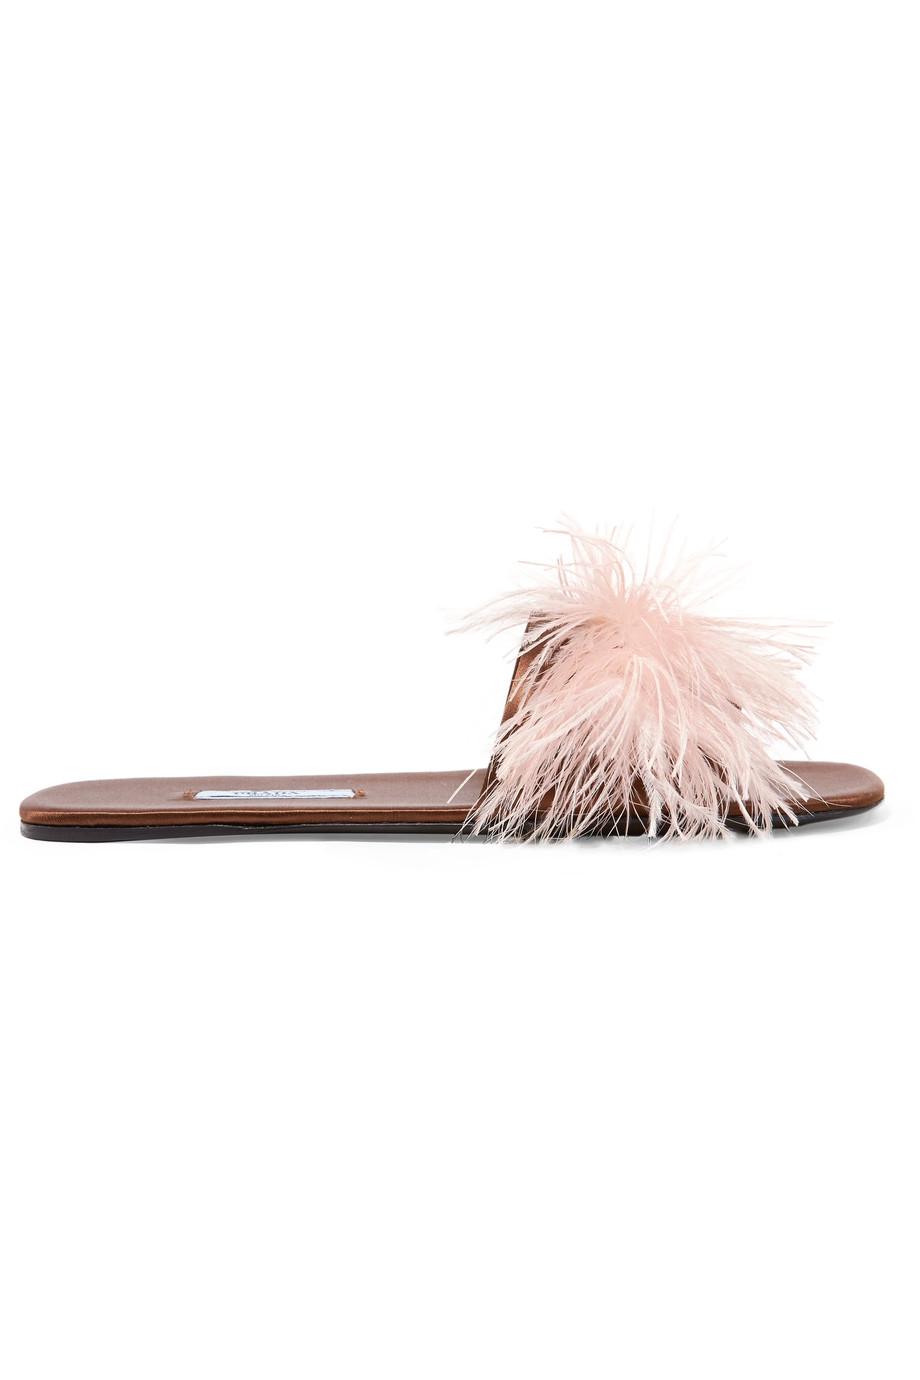 PRADA Feather-embellished satin slides £490 netaporter.com